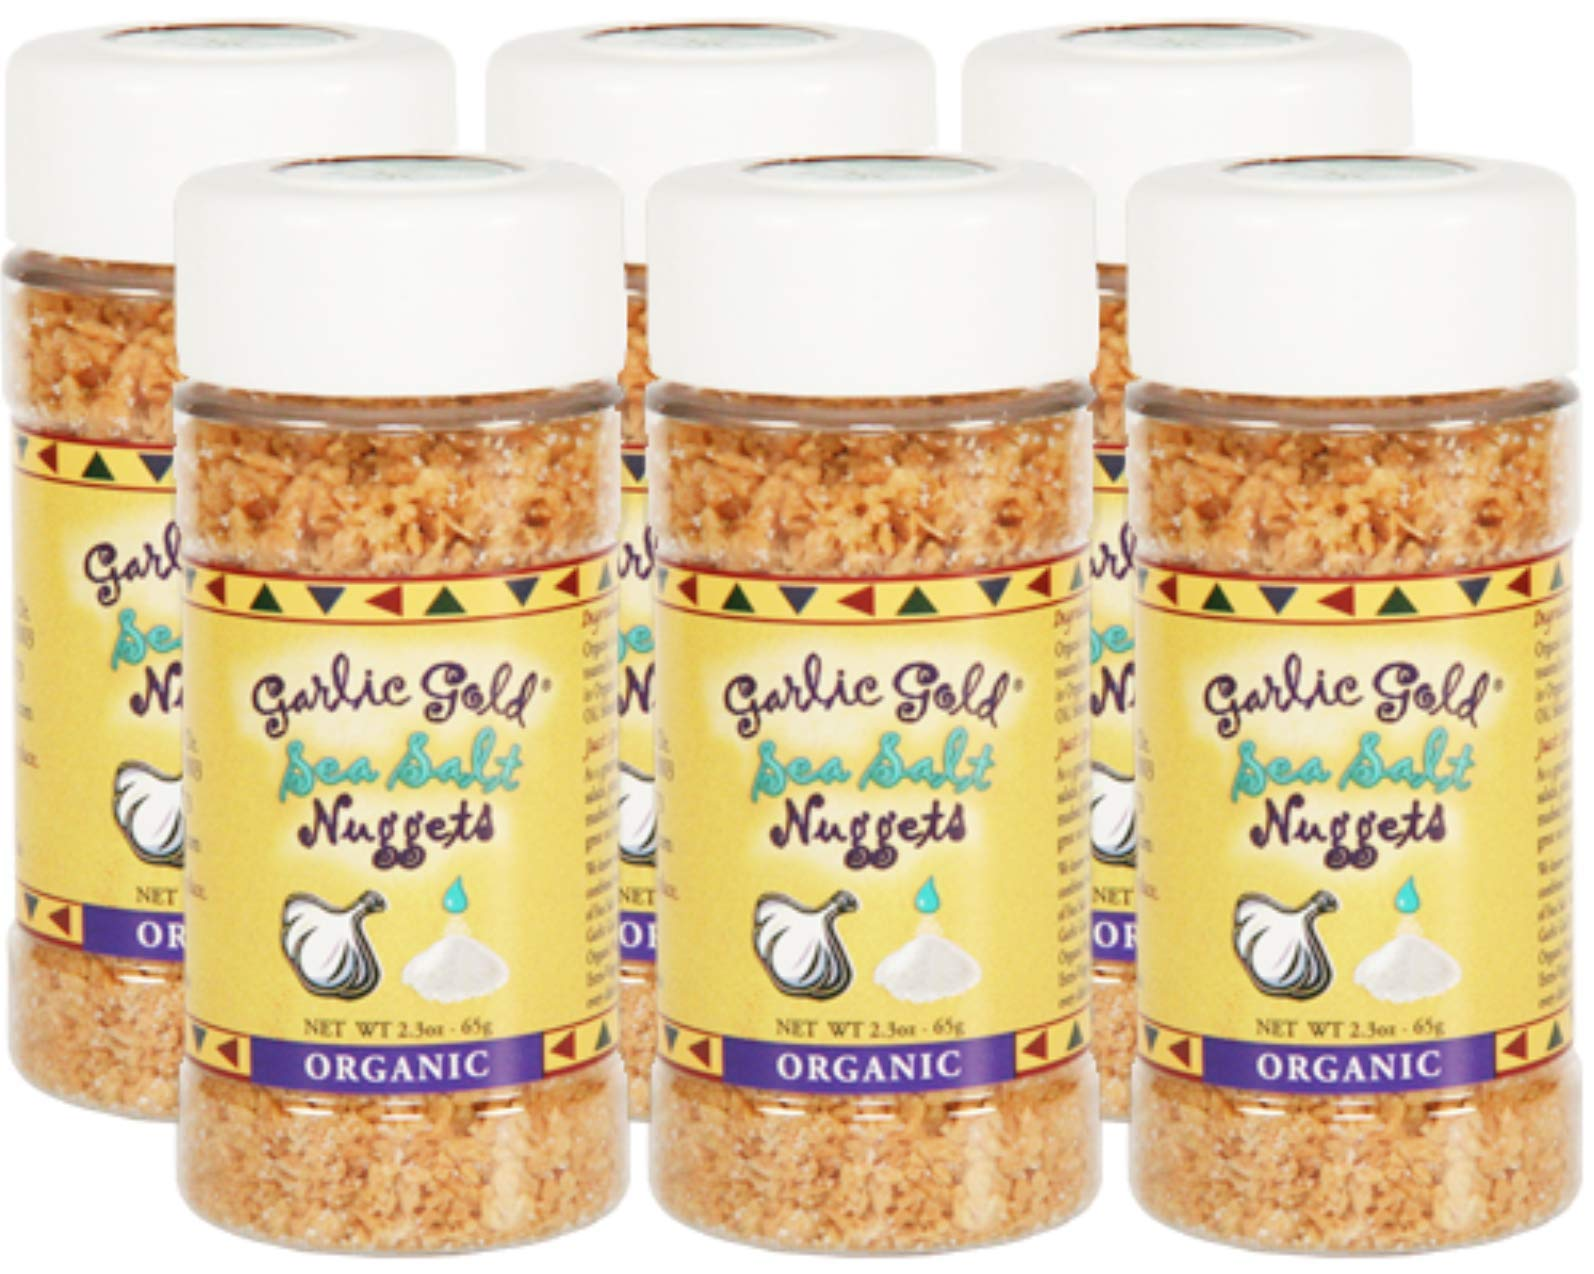 Garlic Gold, Garlic Nuggets Sea Salt Organic, 2.3 Ounce